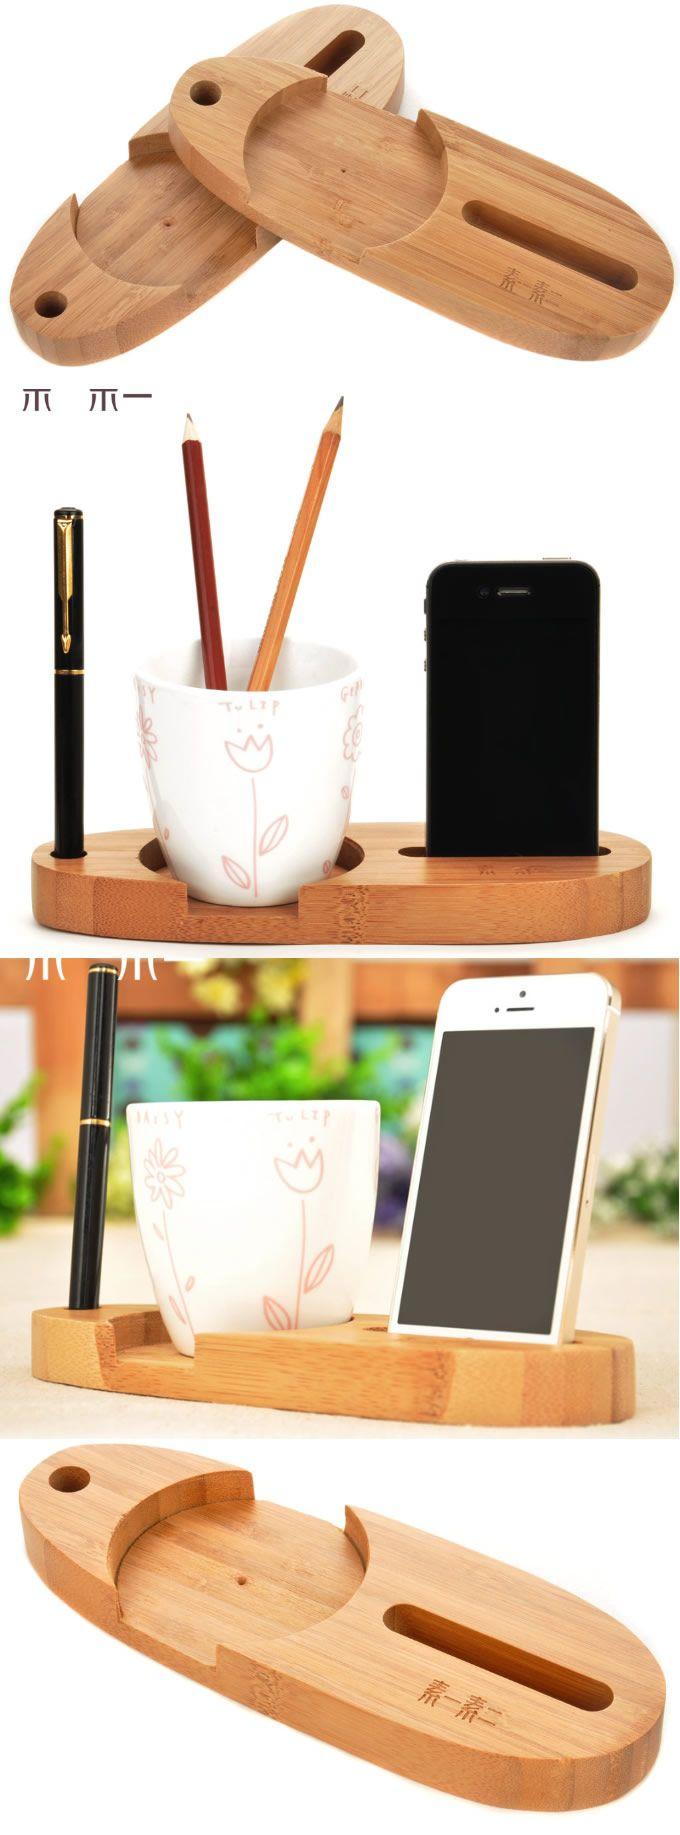 Multipurpose Wooden Office Desk Organizer Cup Slots iPhone Smart ...